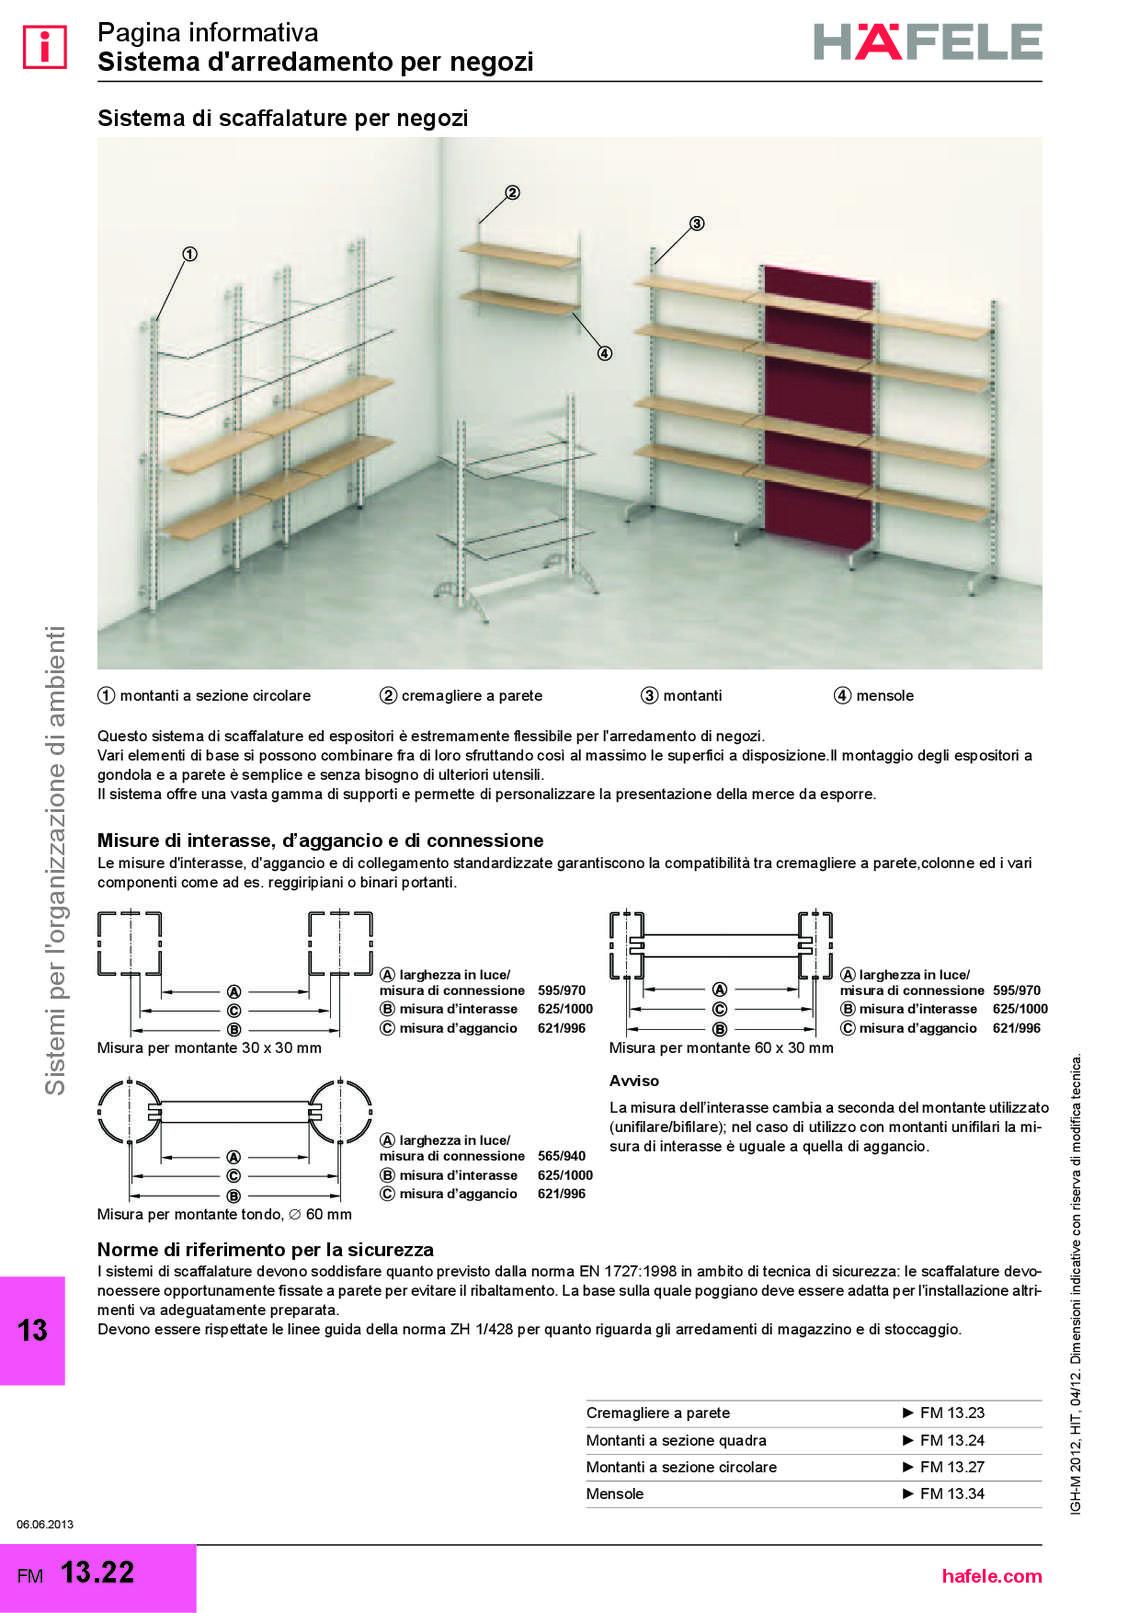 hafele-arredo-negozi-e-farmacie_32_033.jpg